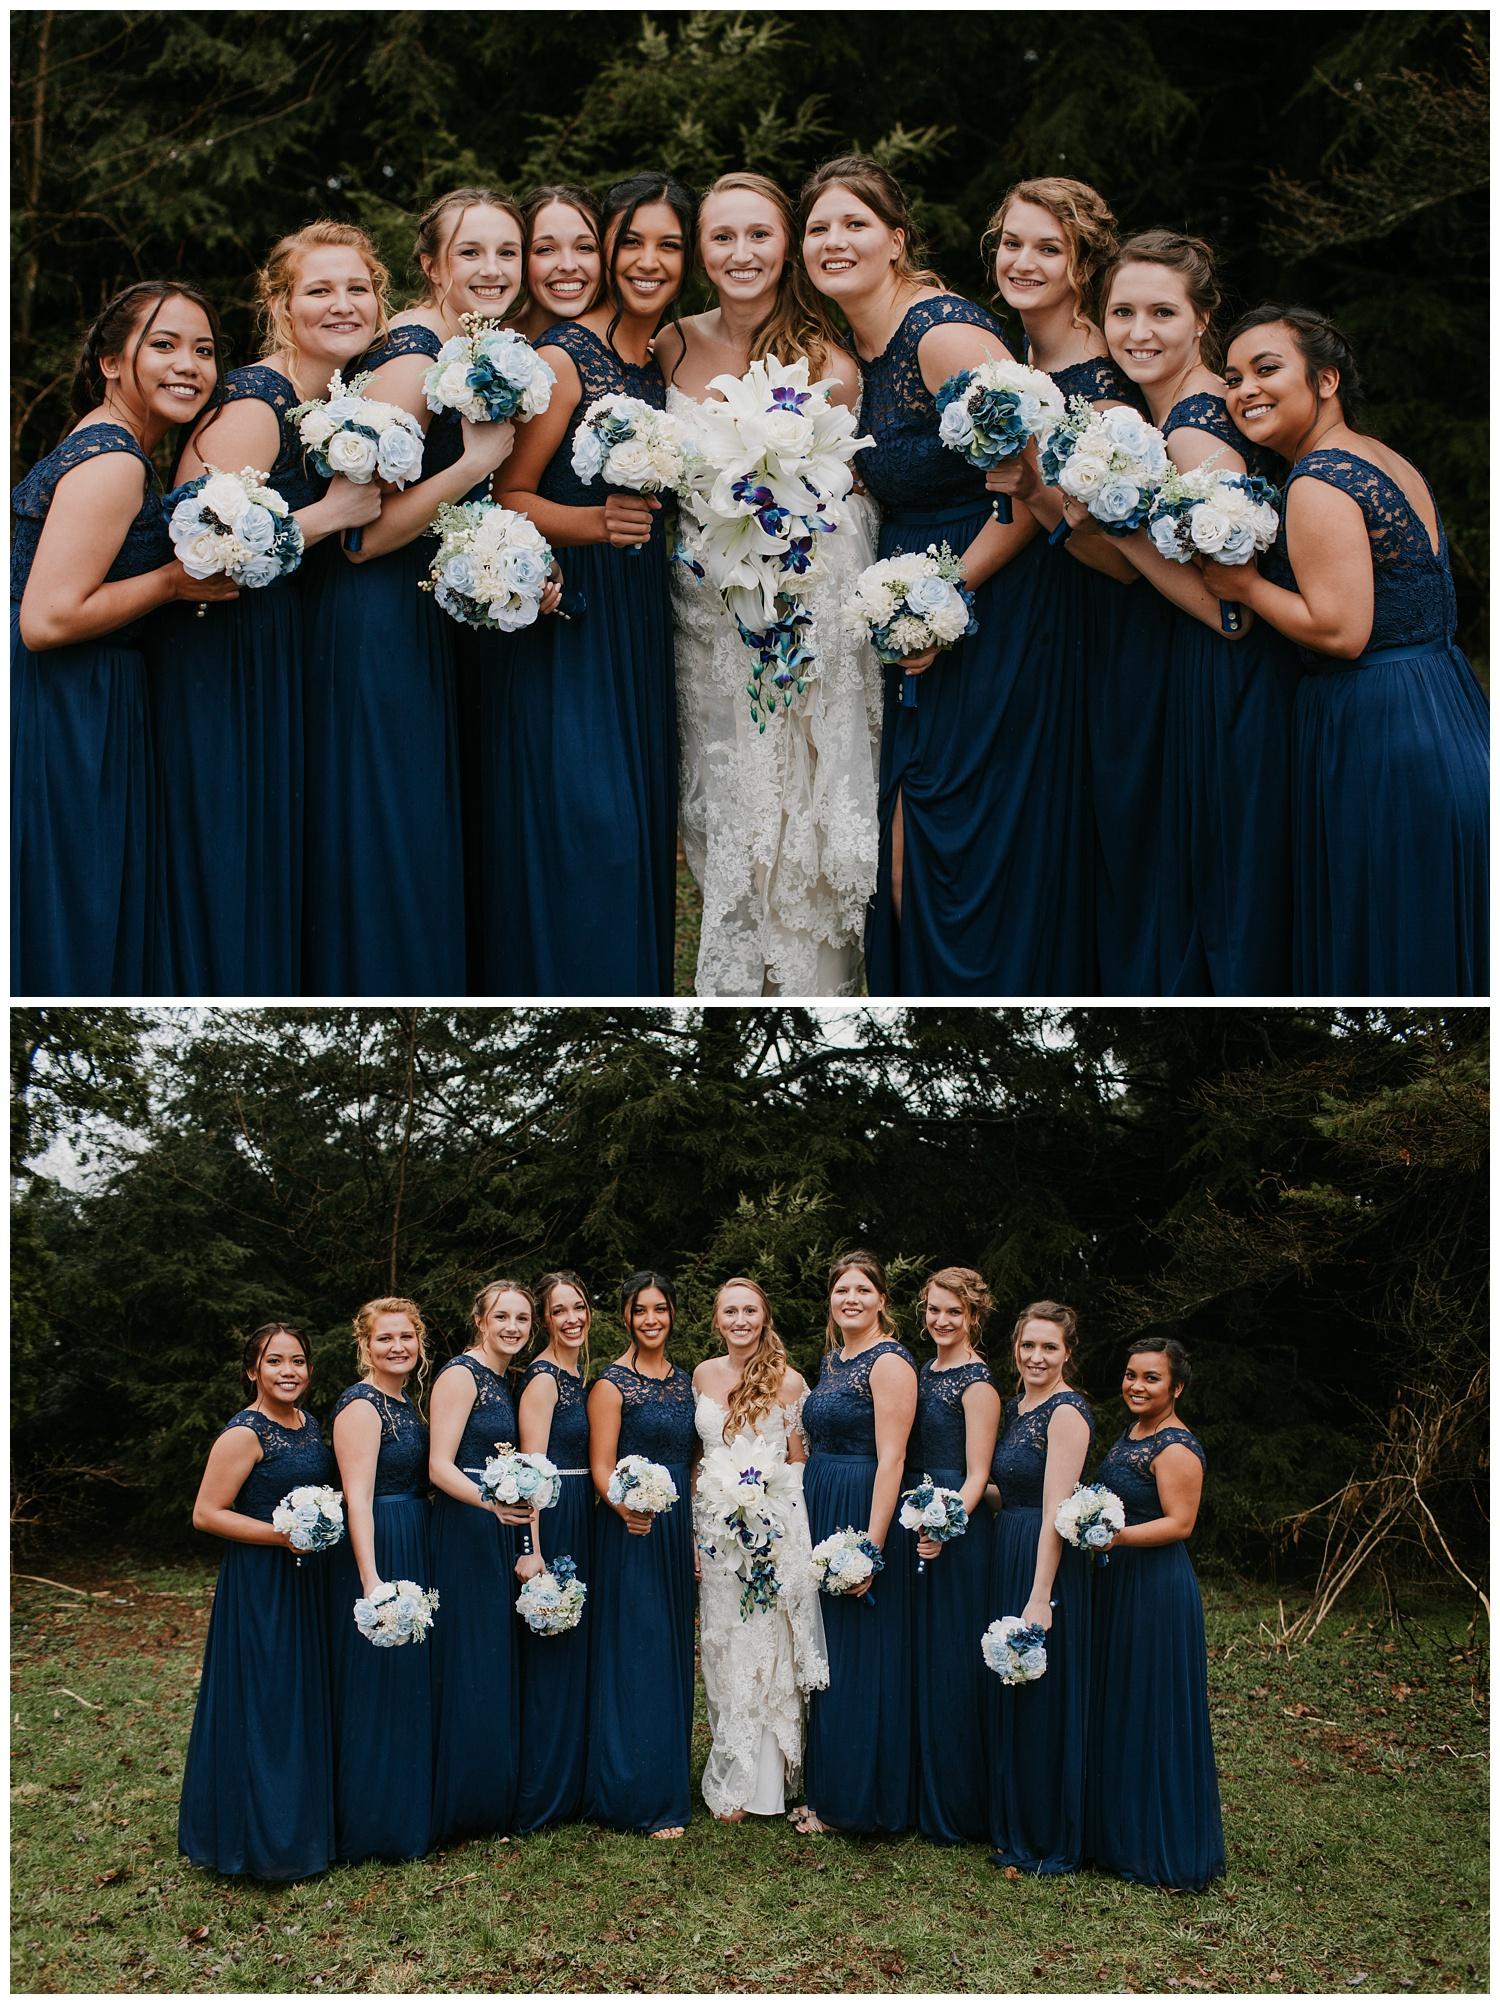 Shadowland Silver Beach St. Joseph Wedding Photographer Rainy Wedding13.jpg